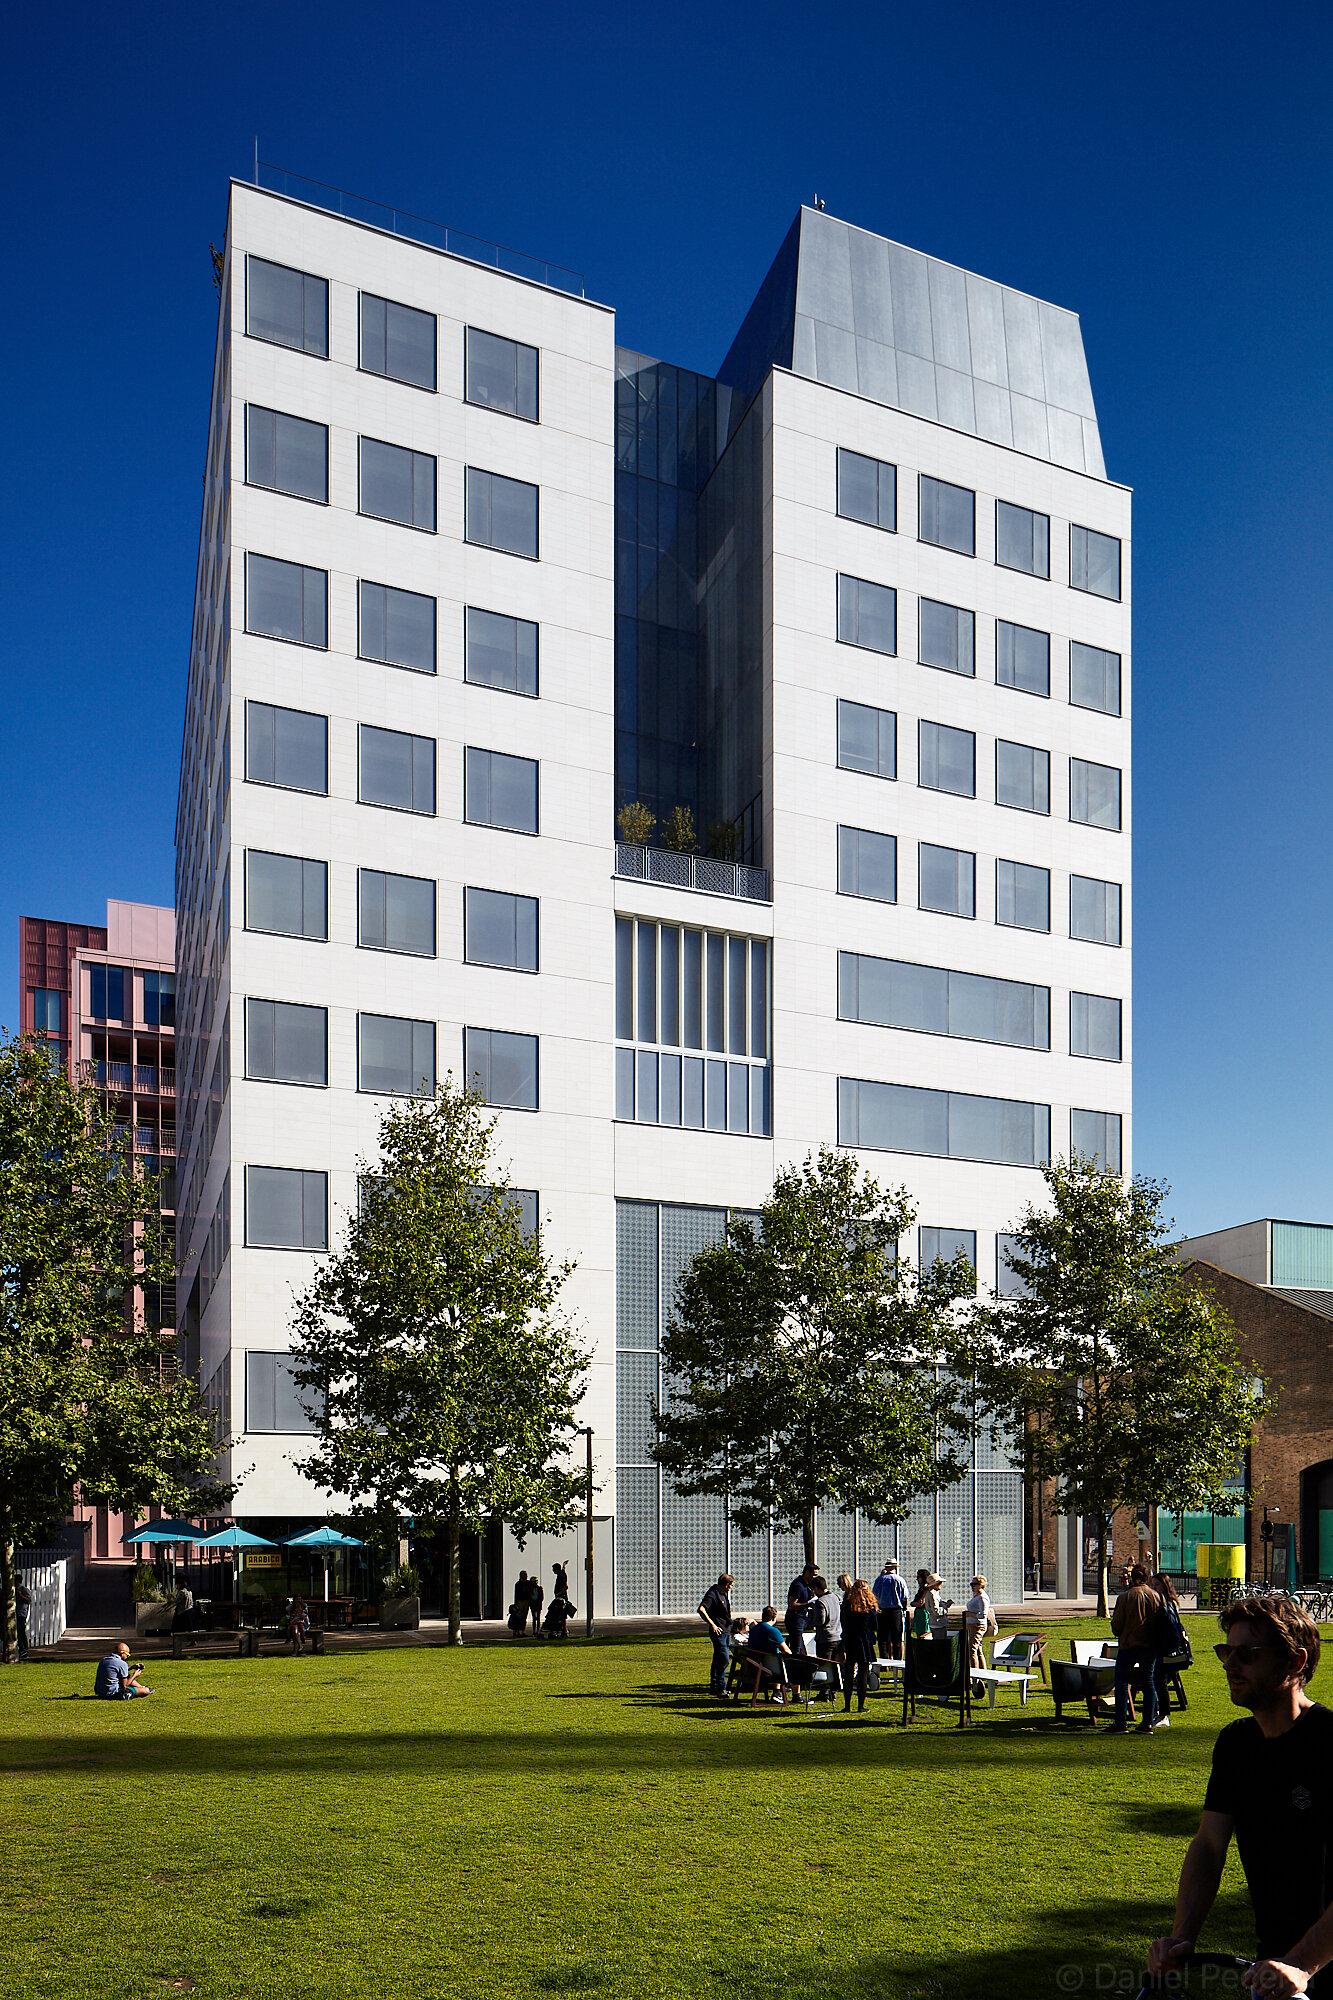 Aga Khan Centre, Kings Cross, London